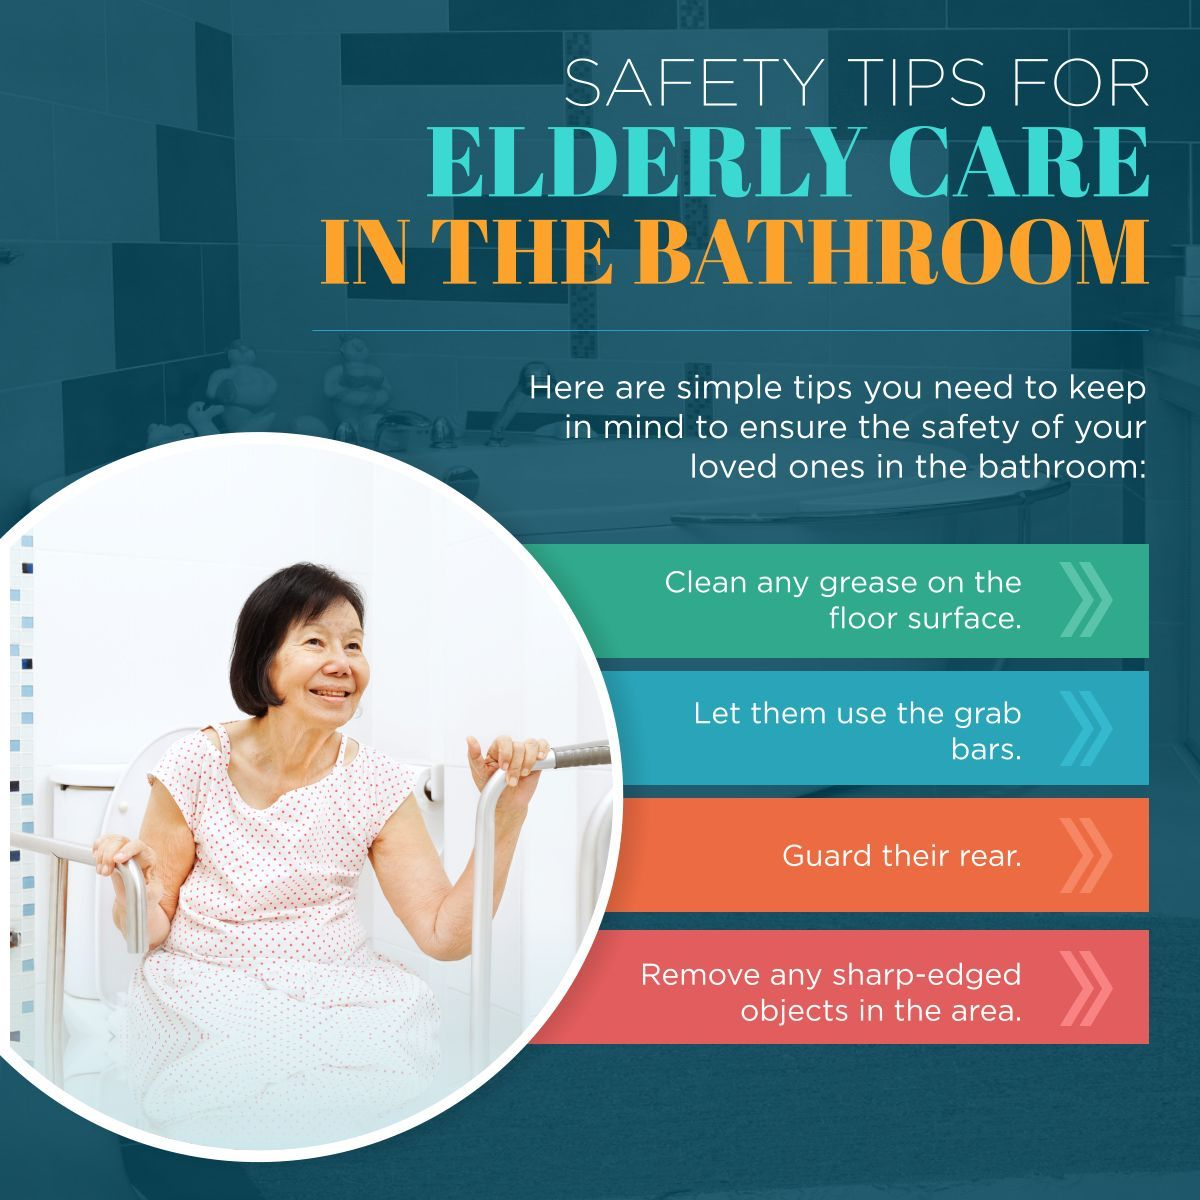 Safety Tips for Elderly Care in the Bathroom ElderlyCare